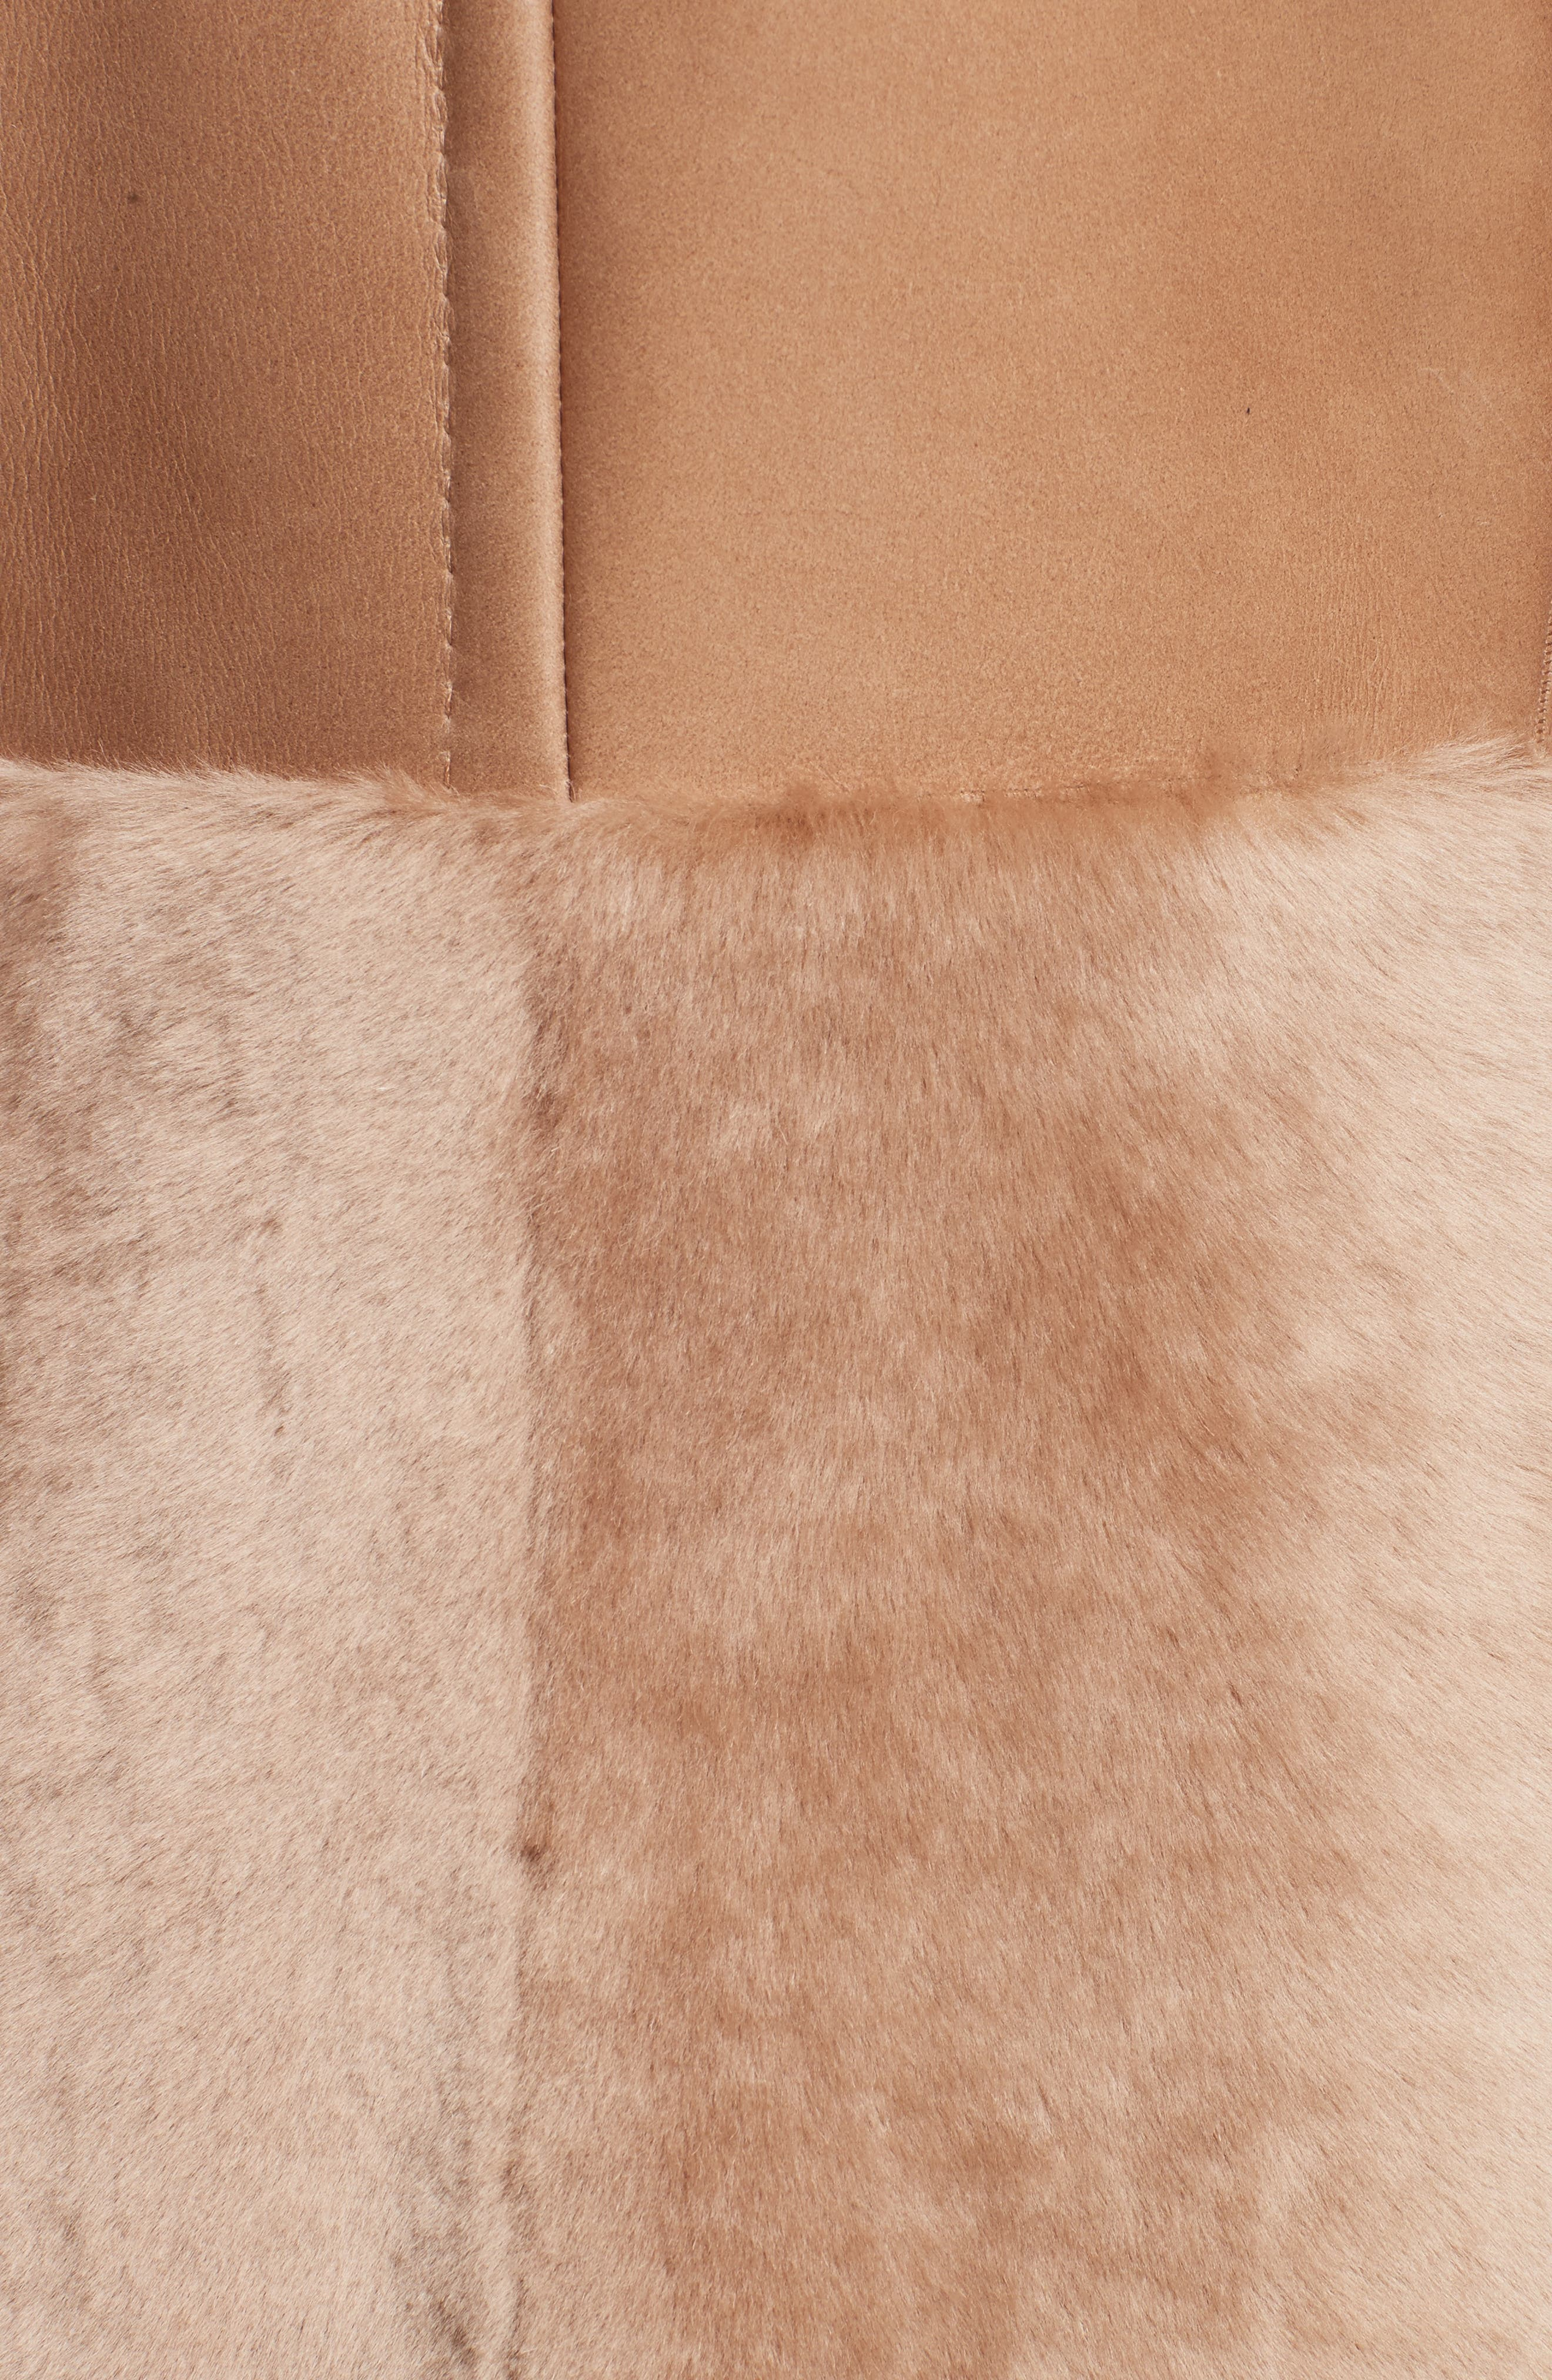 MAX MARA, Rimini Genuine Shearling Coat, Alternate thumbnail 6, color, CAMEL